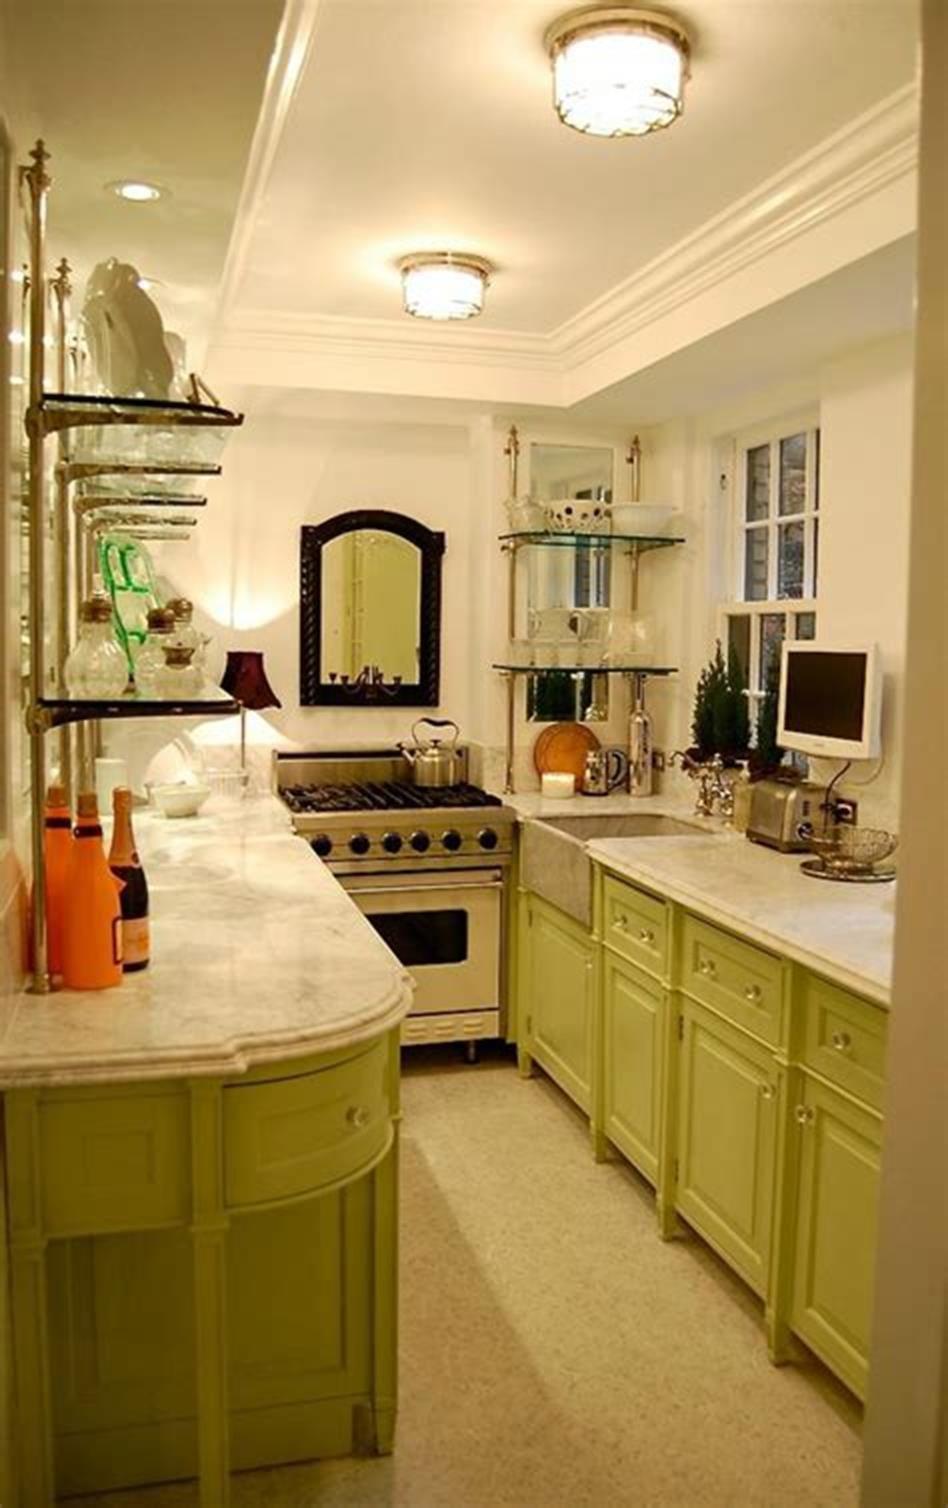 Kitchen Renovation Ideas For Small Kitchens